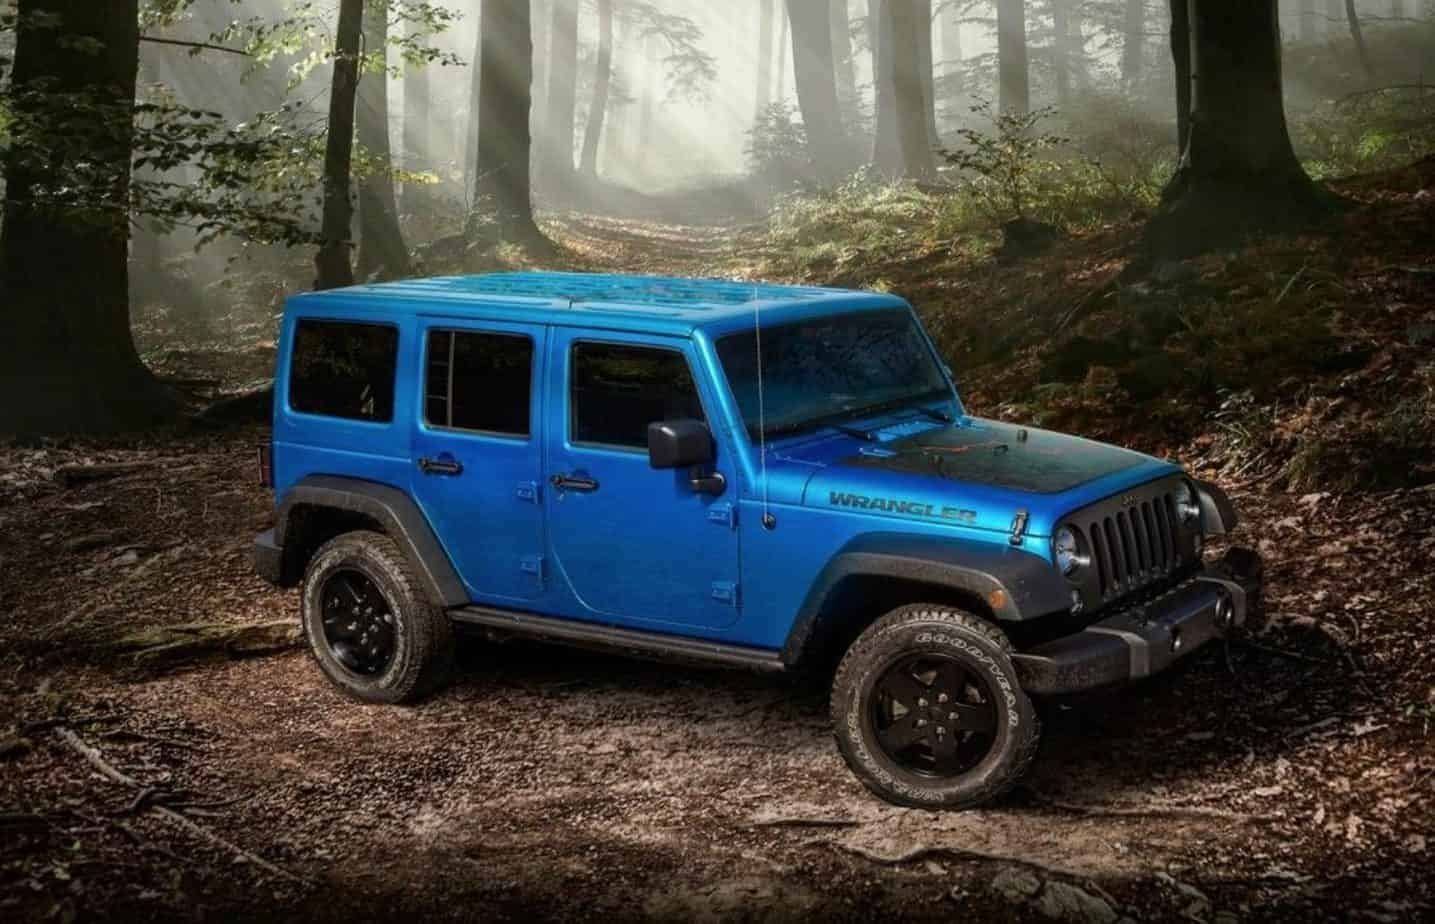 fiat chrysler to produce 2018 model year jeep jk expedition portal. Black Bedroom Furniture Sets. Home Design Ideas